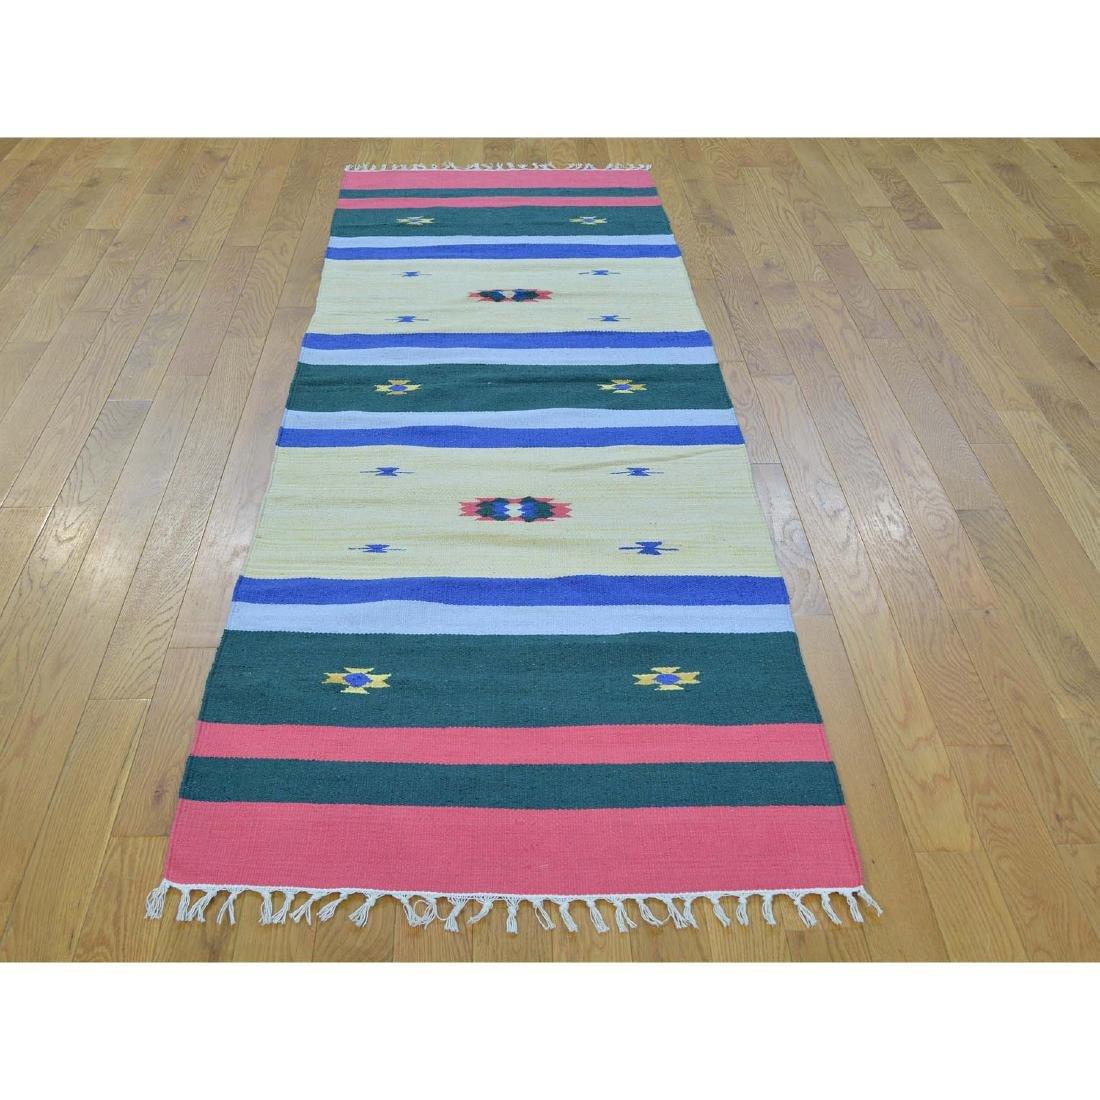 Navajo Design Runner Flat Weave Kilim Hand Woven Rug - 2